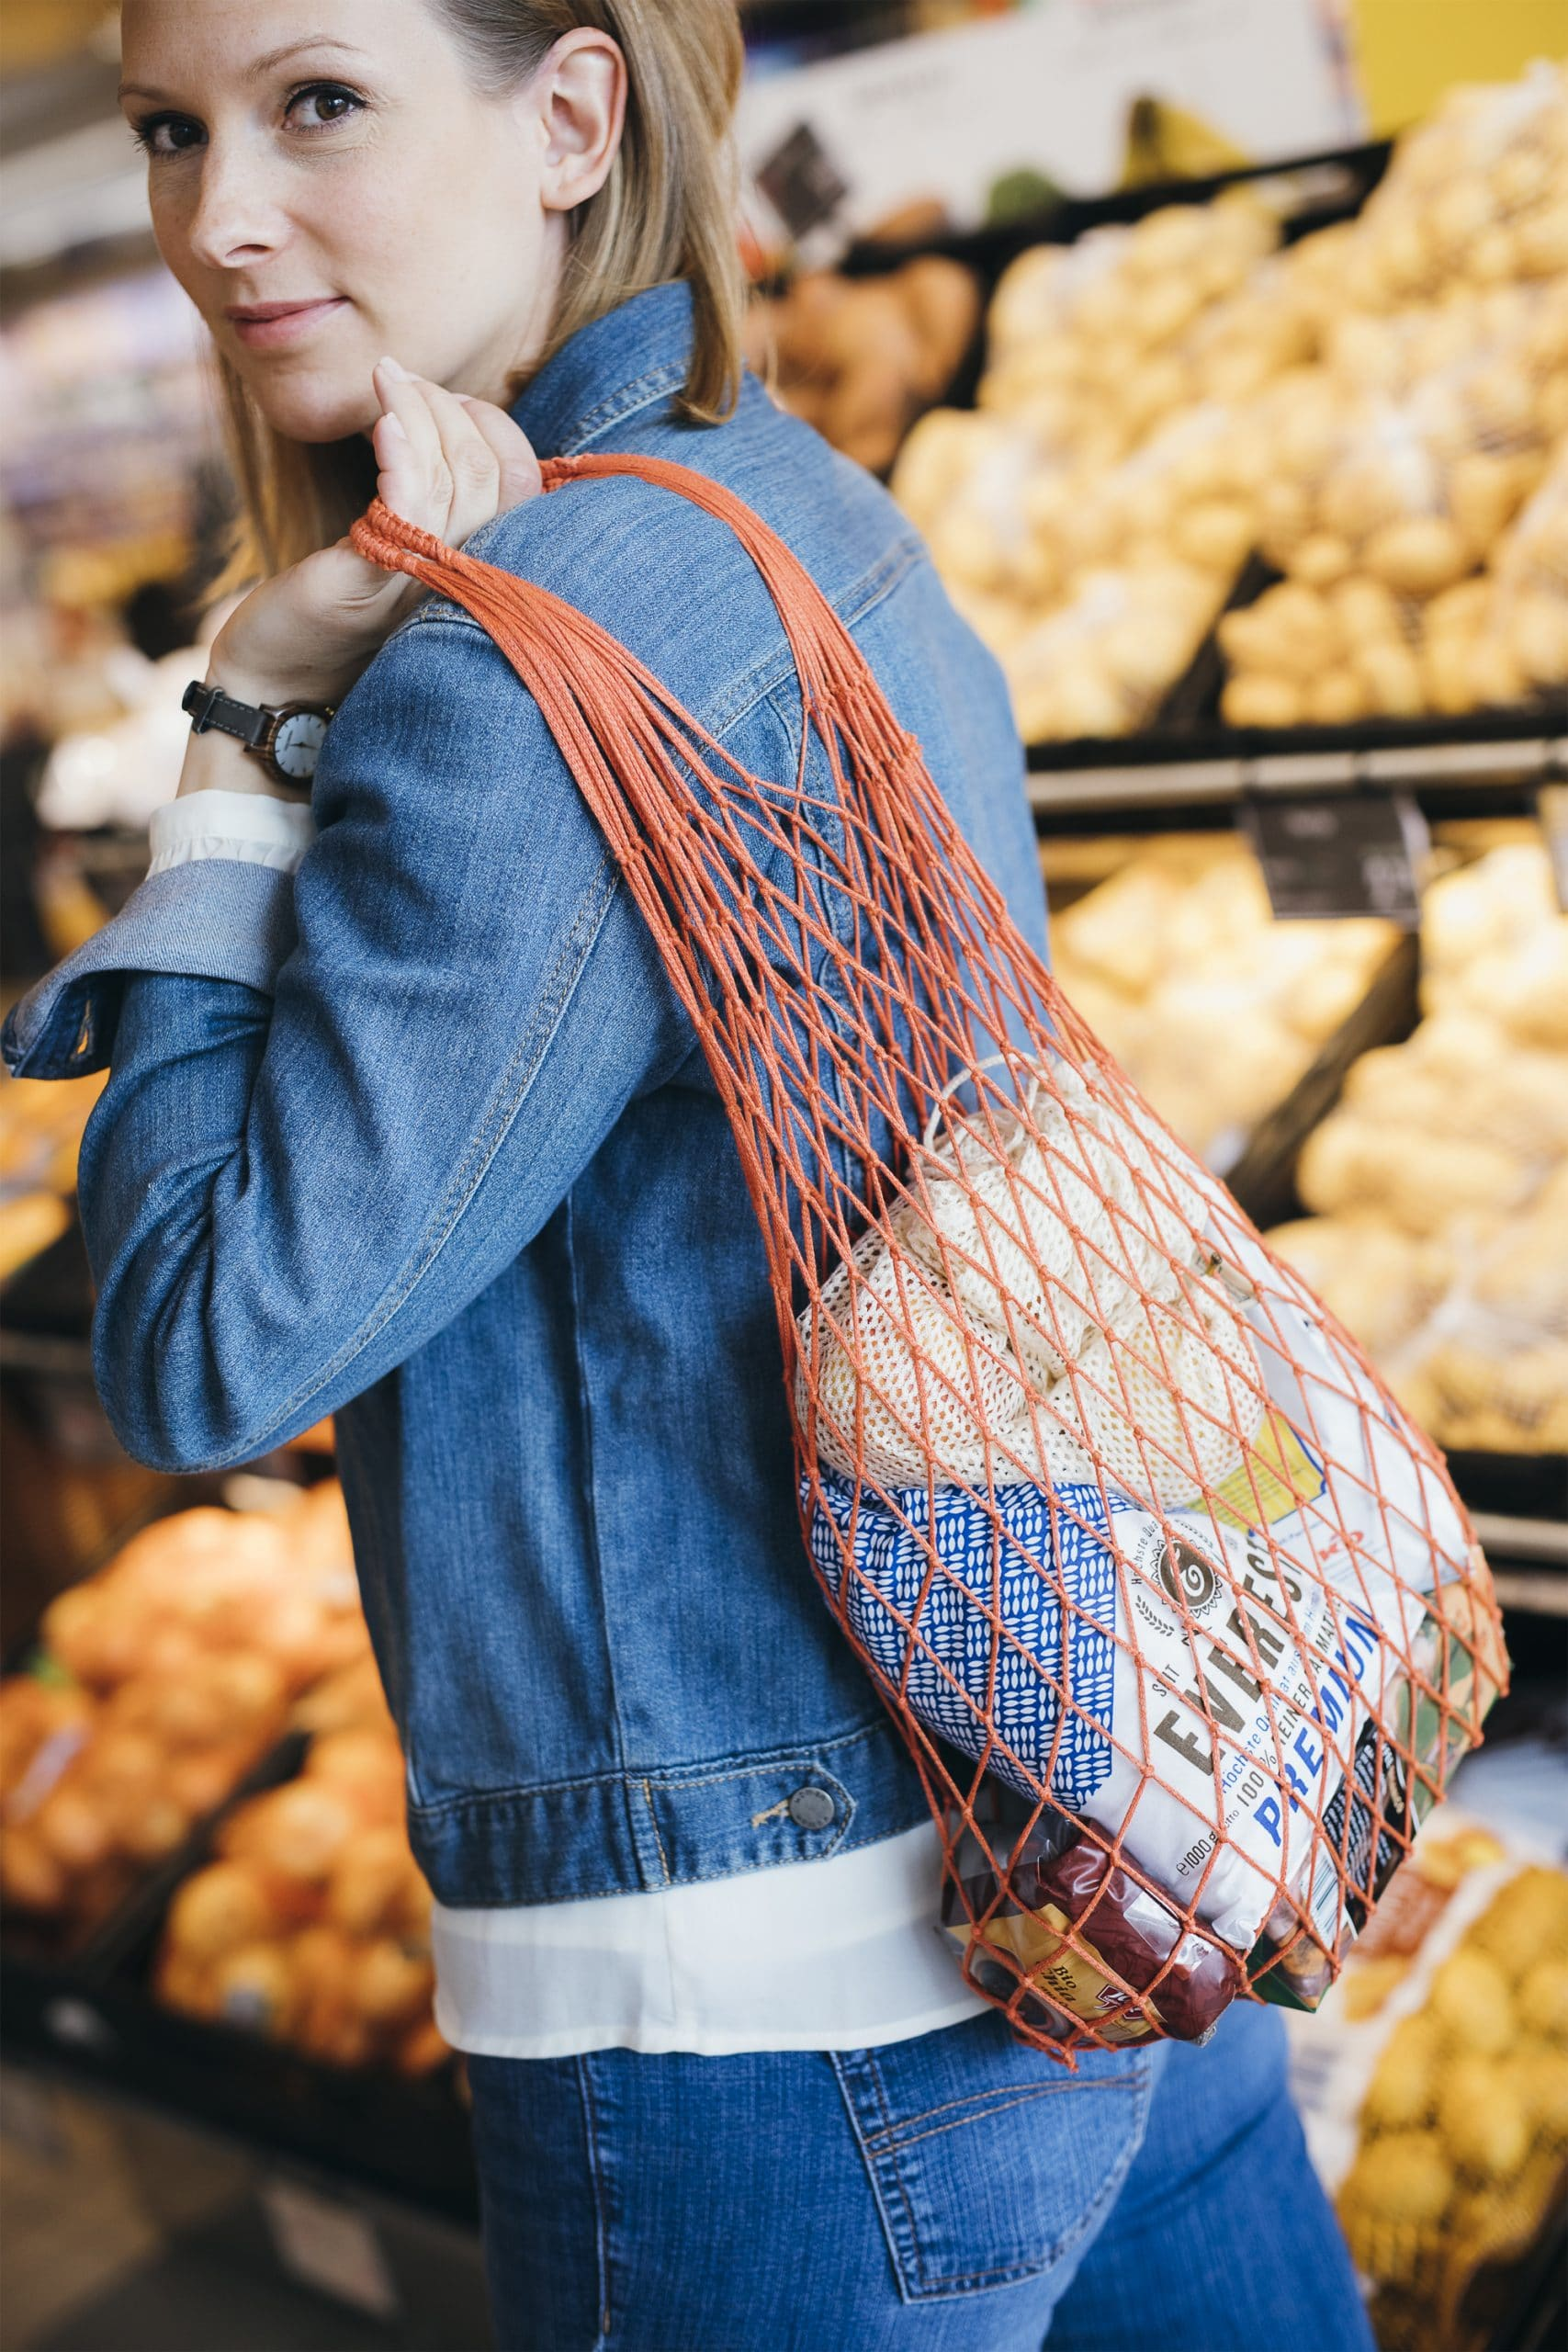 Packnatur Pop-up bag grocery net bag in action